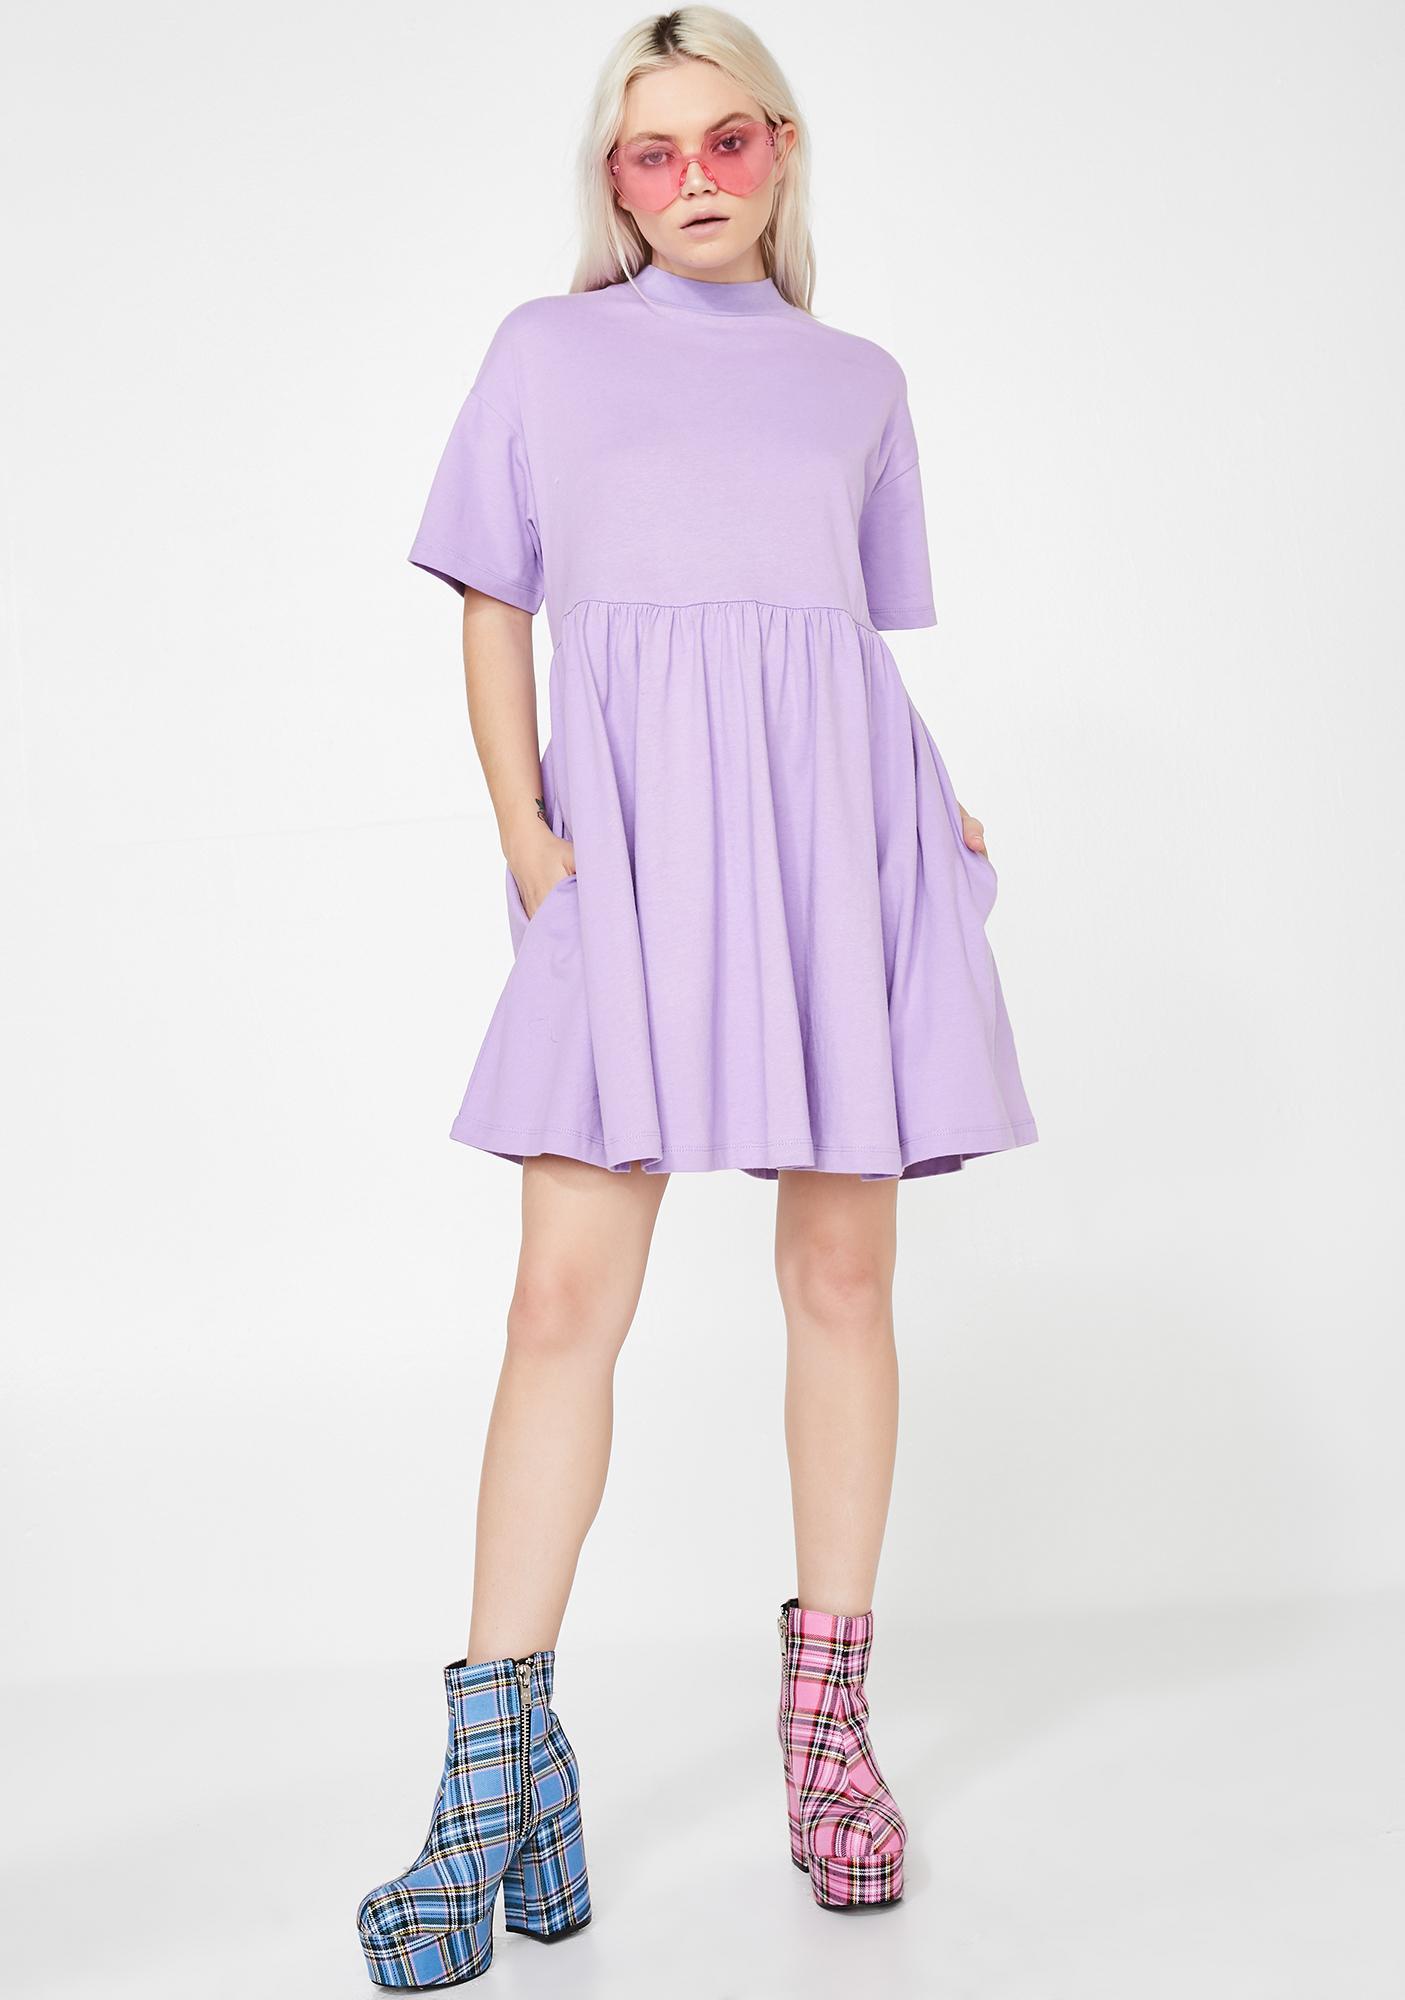 Lazy Oaf LO Lilac Short Sleeve Sally Dress